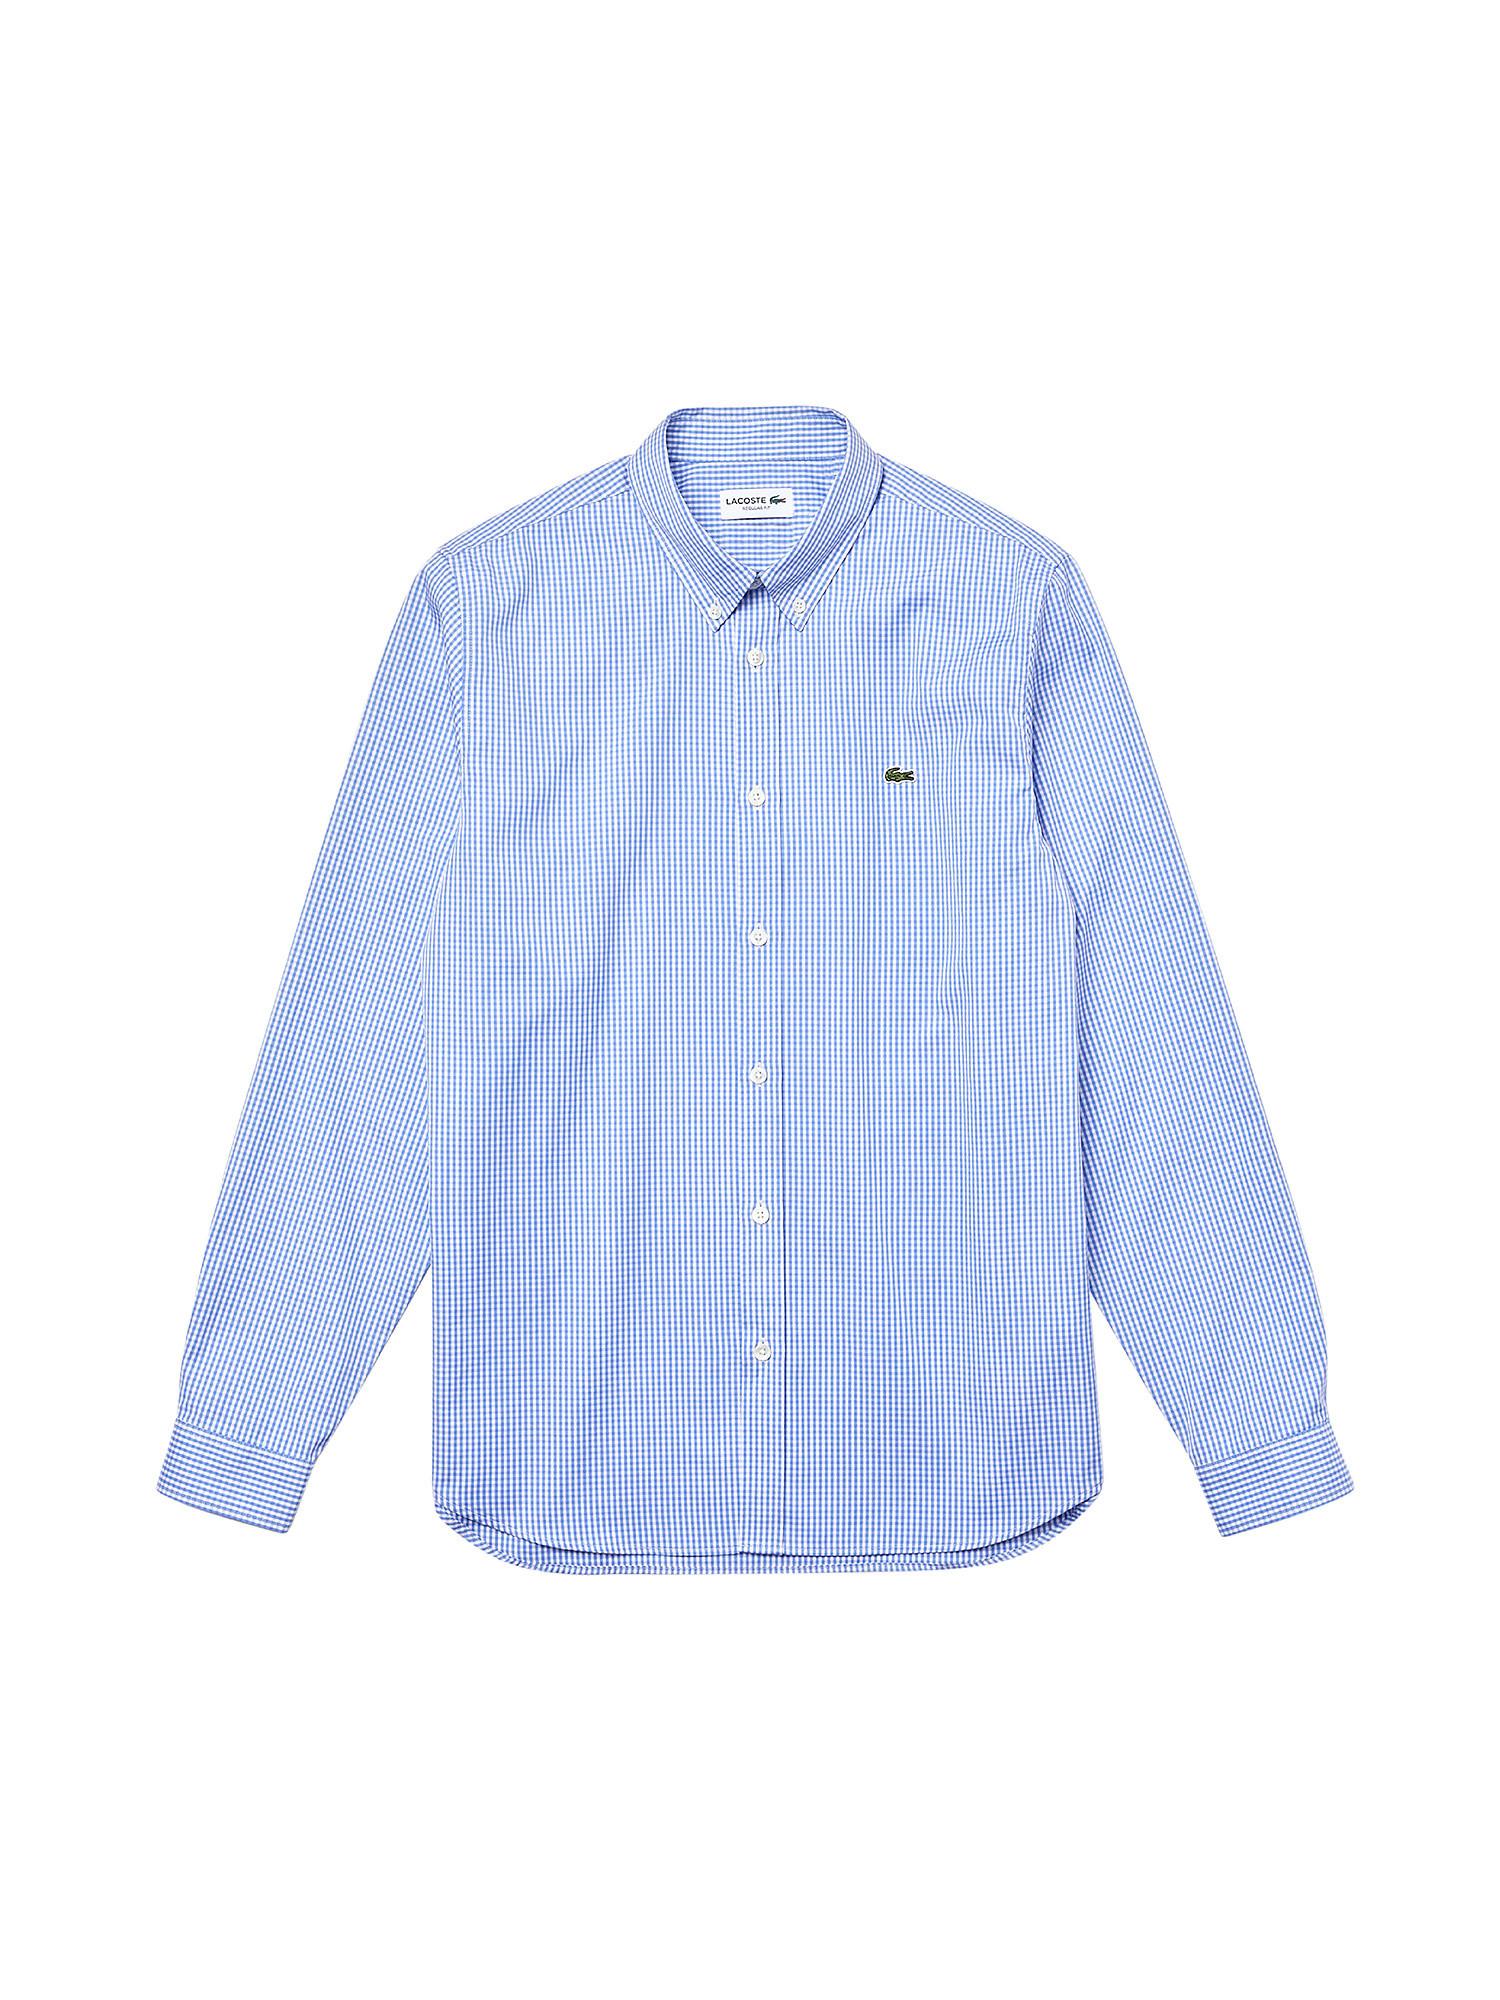 Camicia uomo in cotone, Azzurro, large image number 0